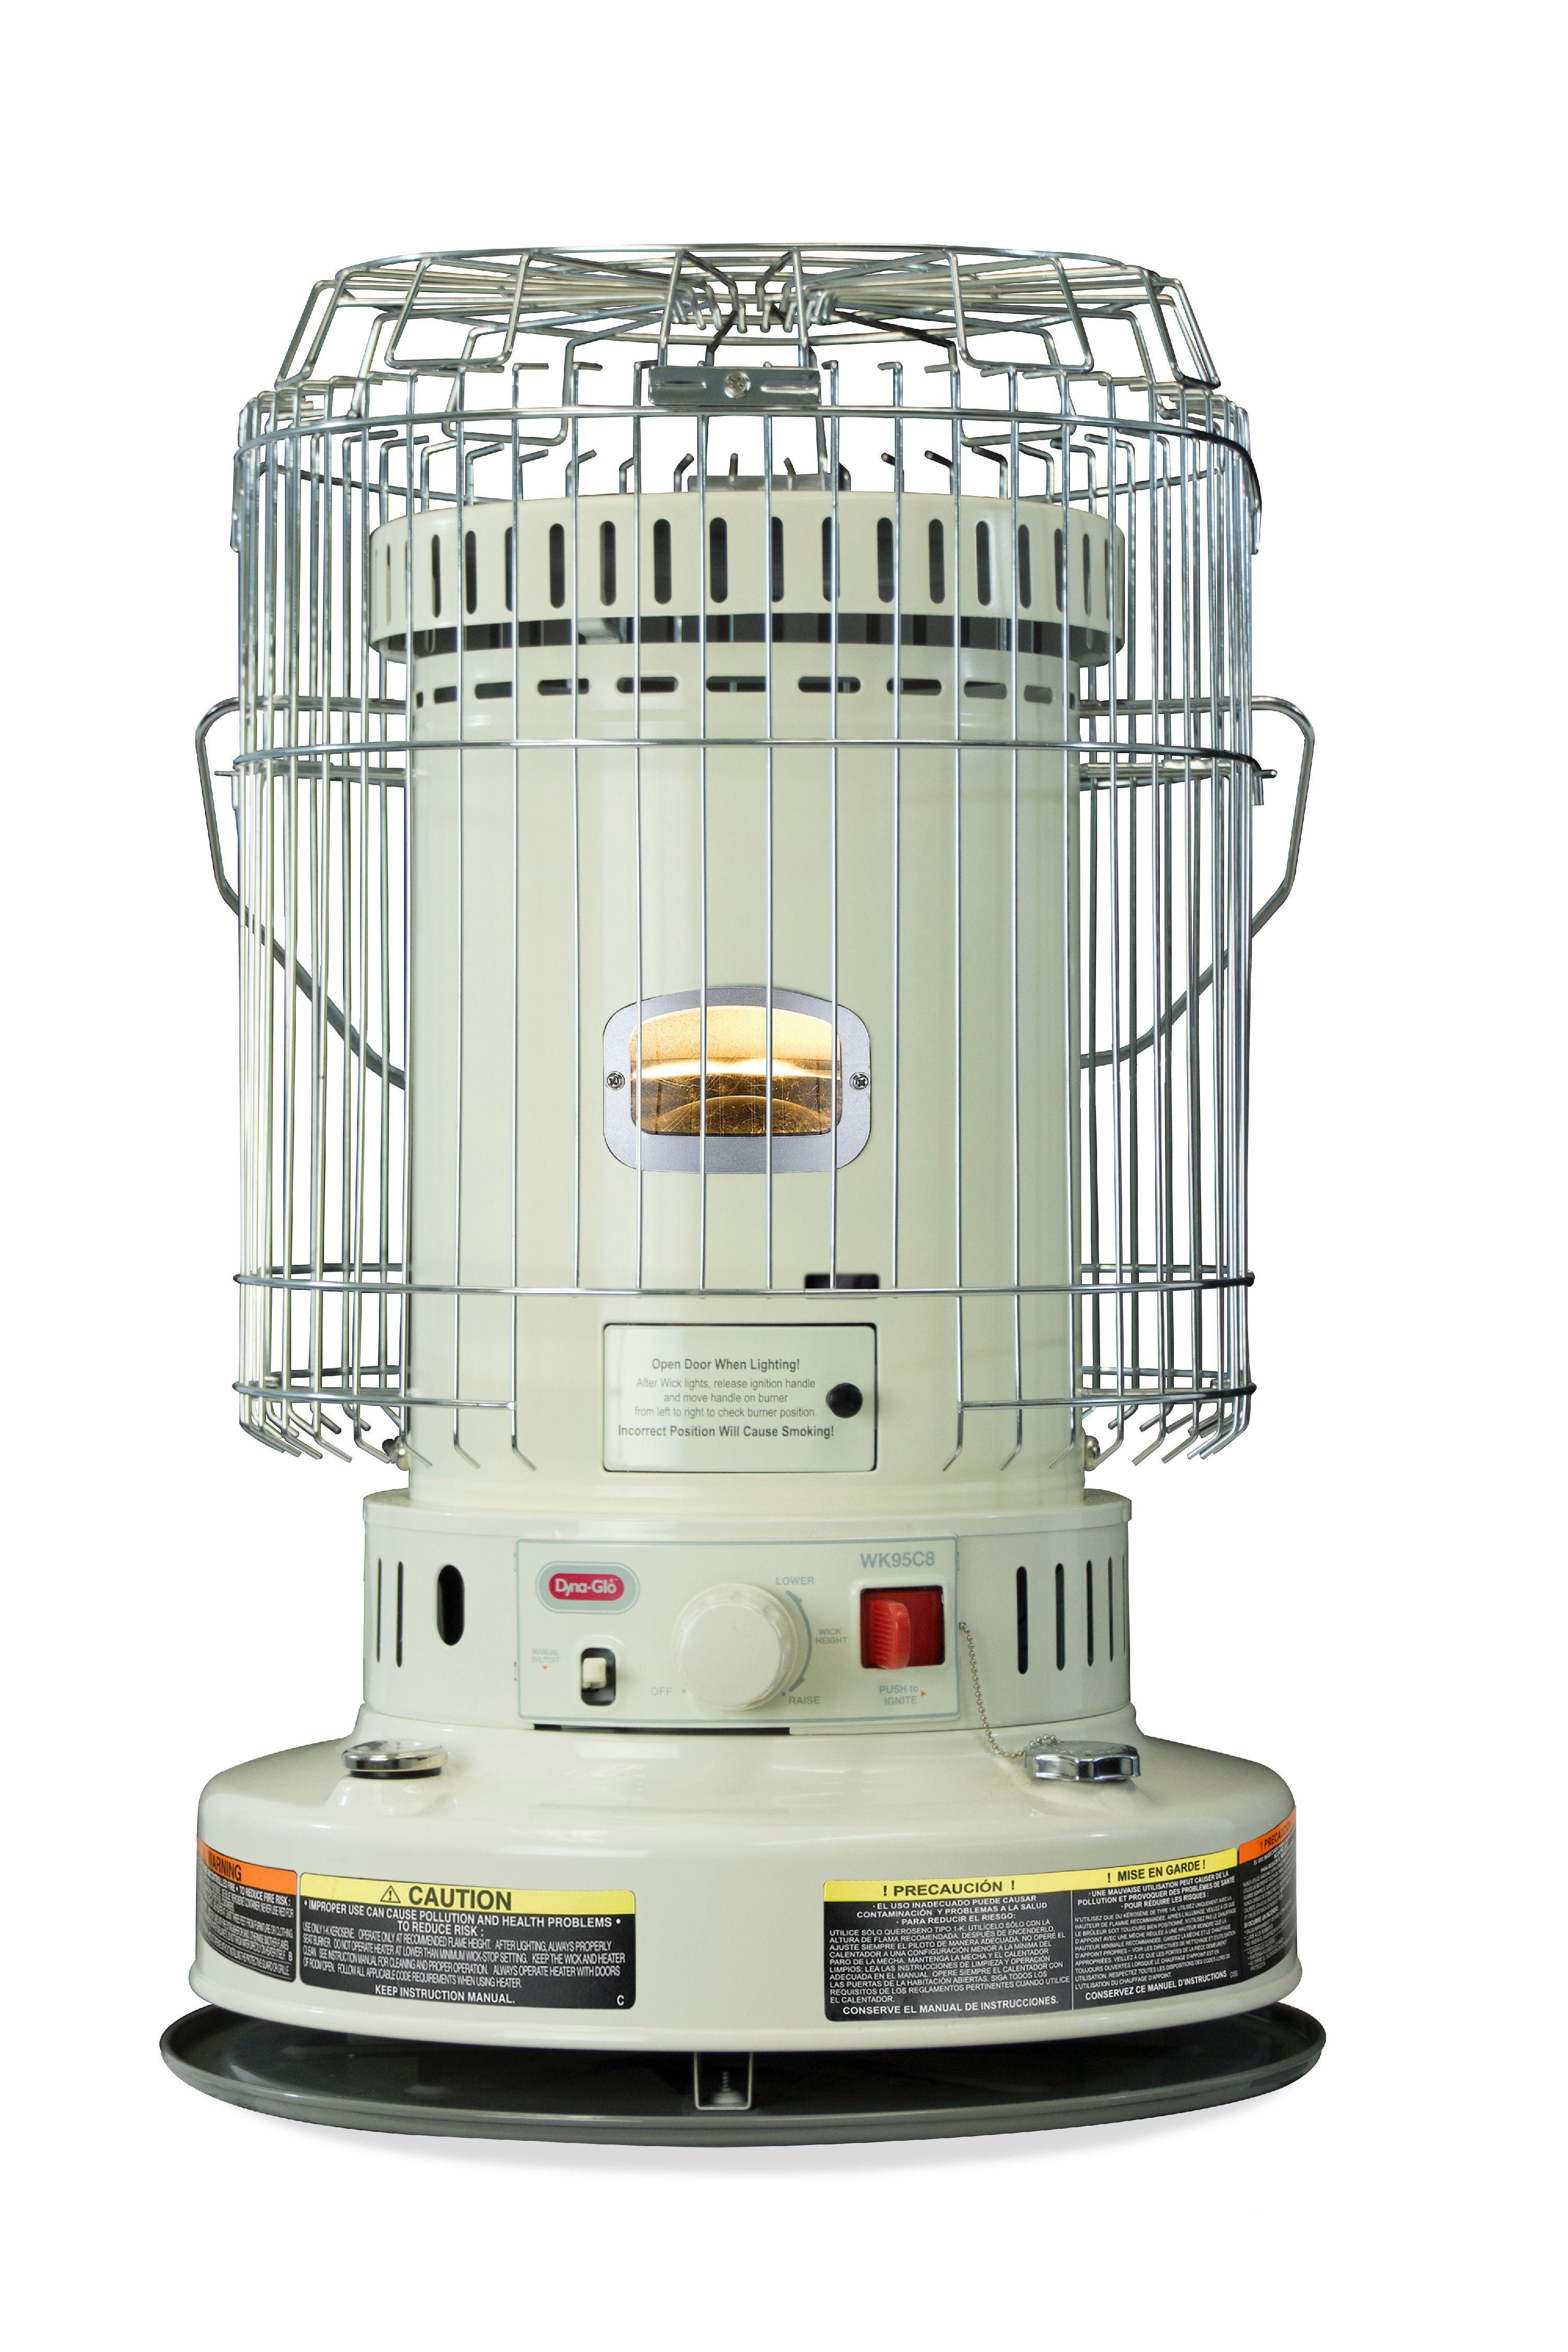 Dyna-Glo WK95C8 23,800 BTU Indoor Kerosene Convection Heater ...